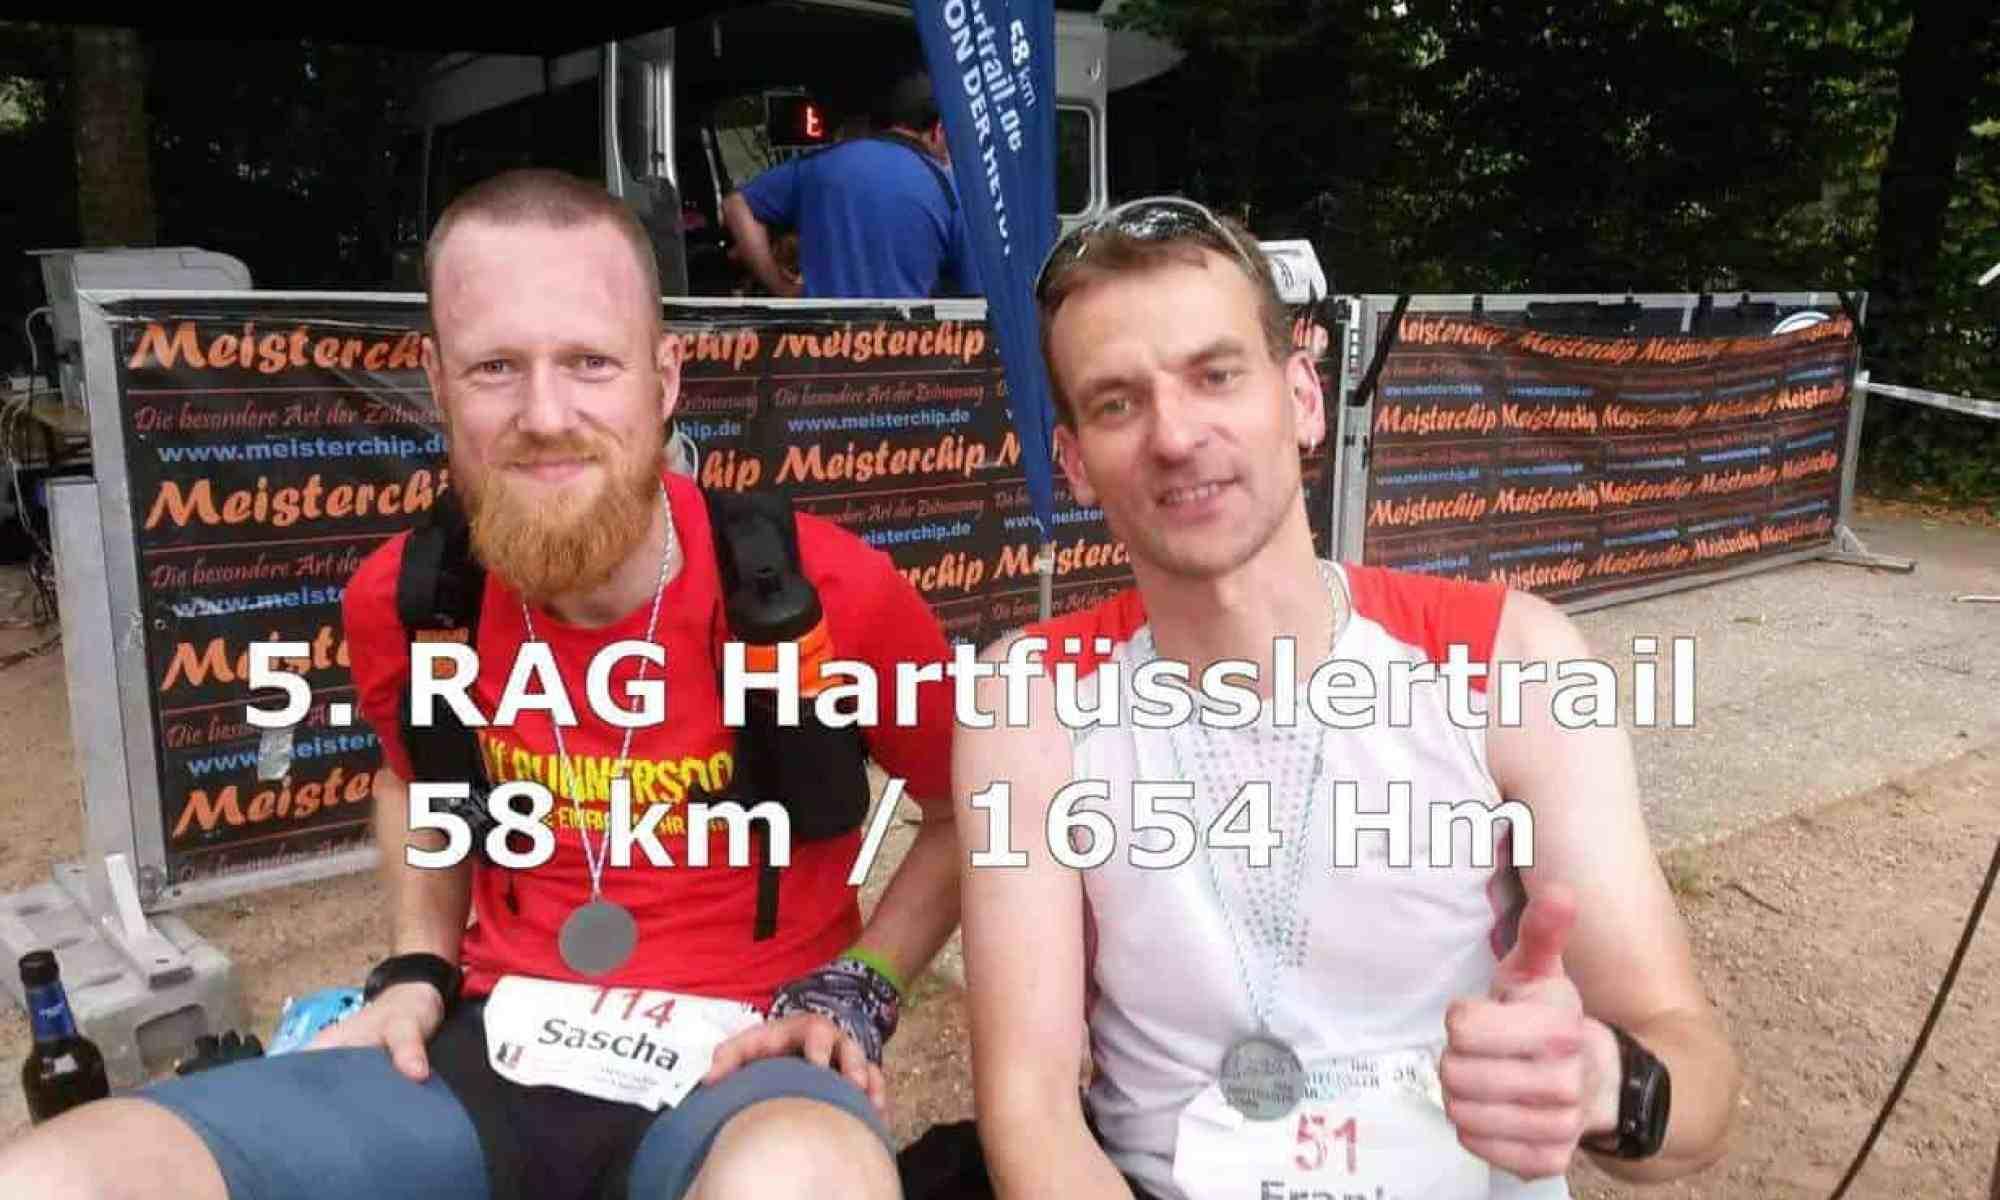 RAG-Hartfuesslertrail-Finisher-banner-1